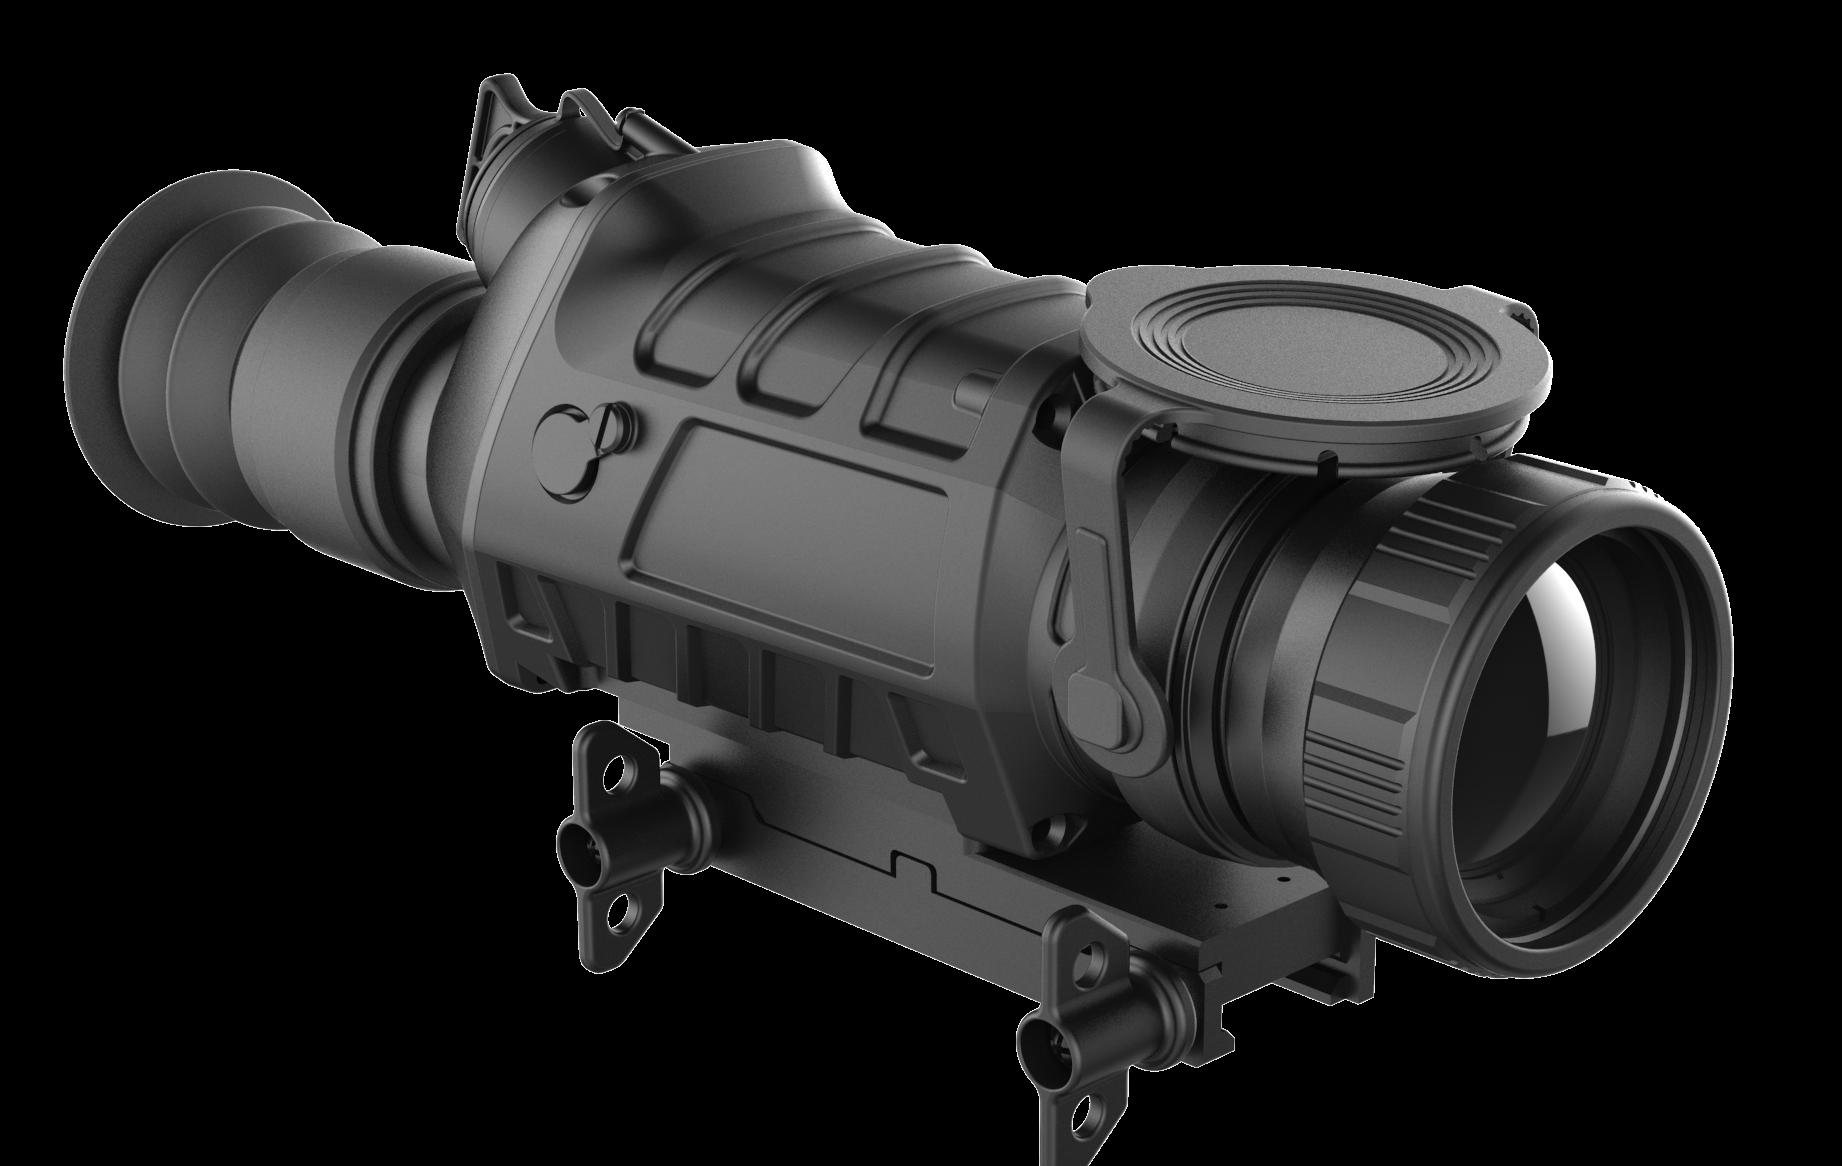 Luneta termowizyjna GUIDE TS450